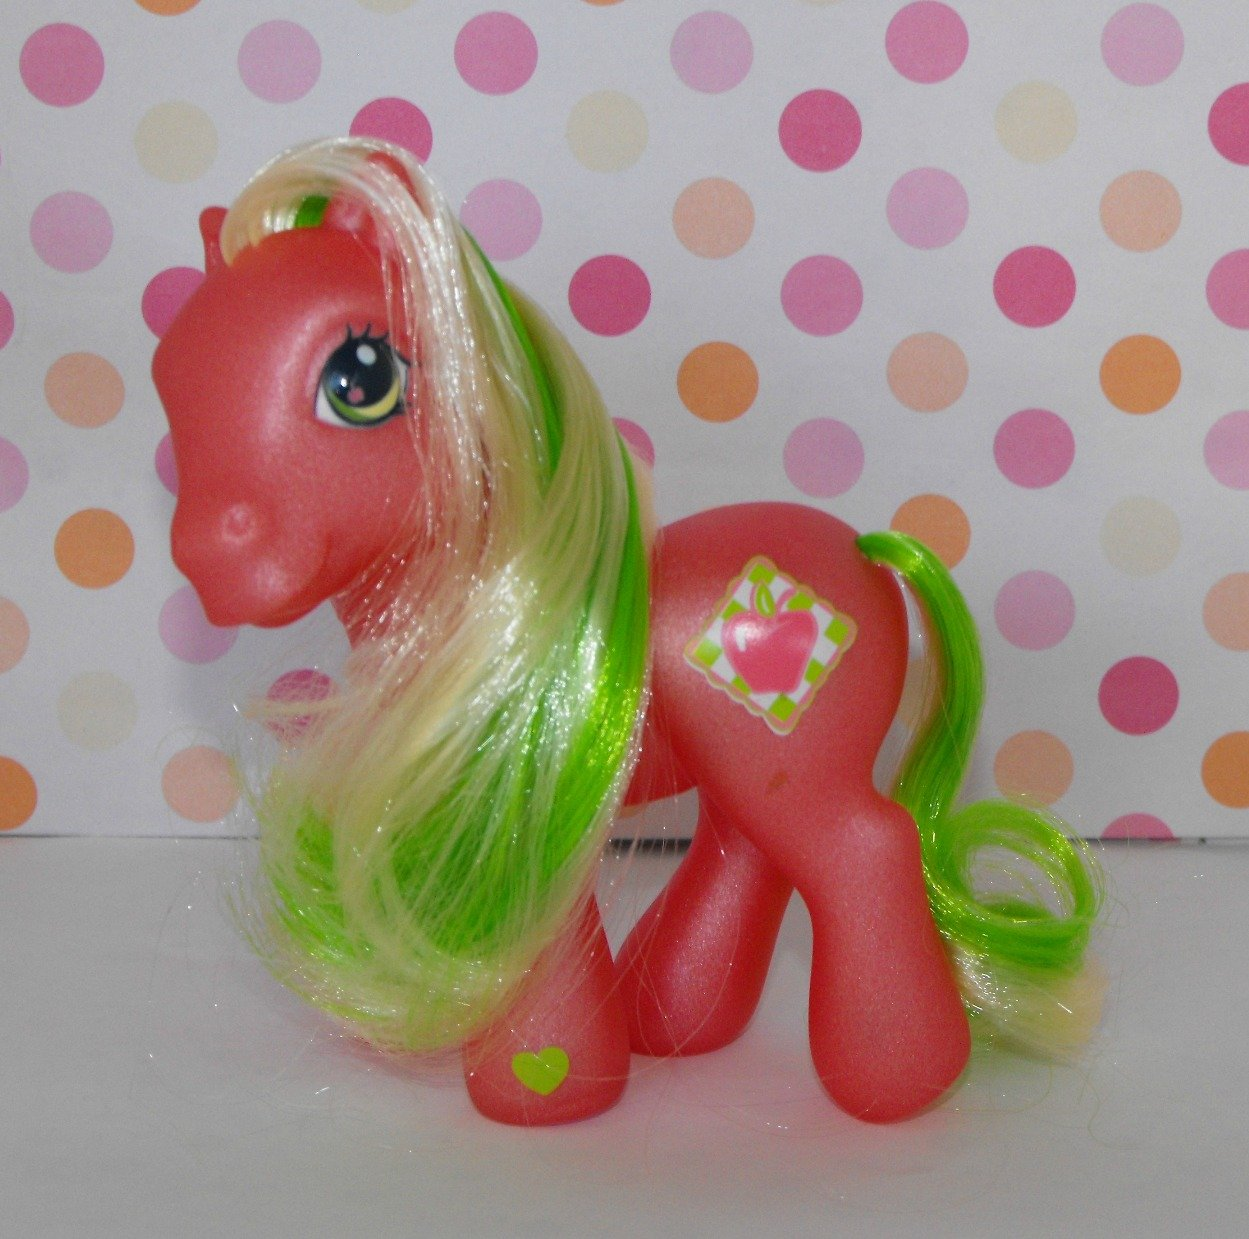 My Little Pony G3 Applejack